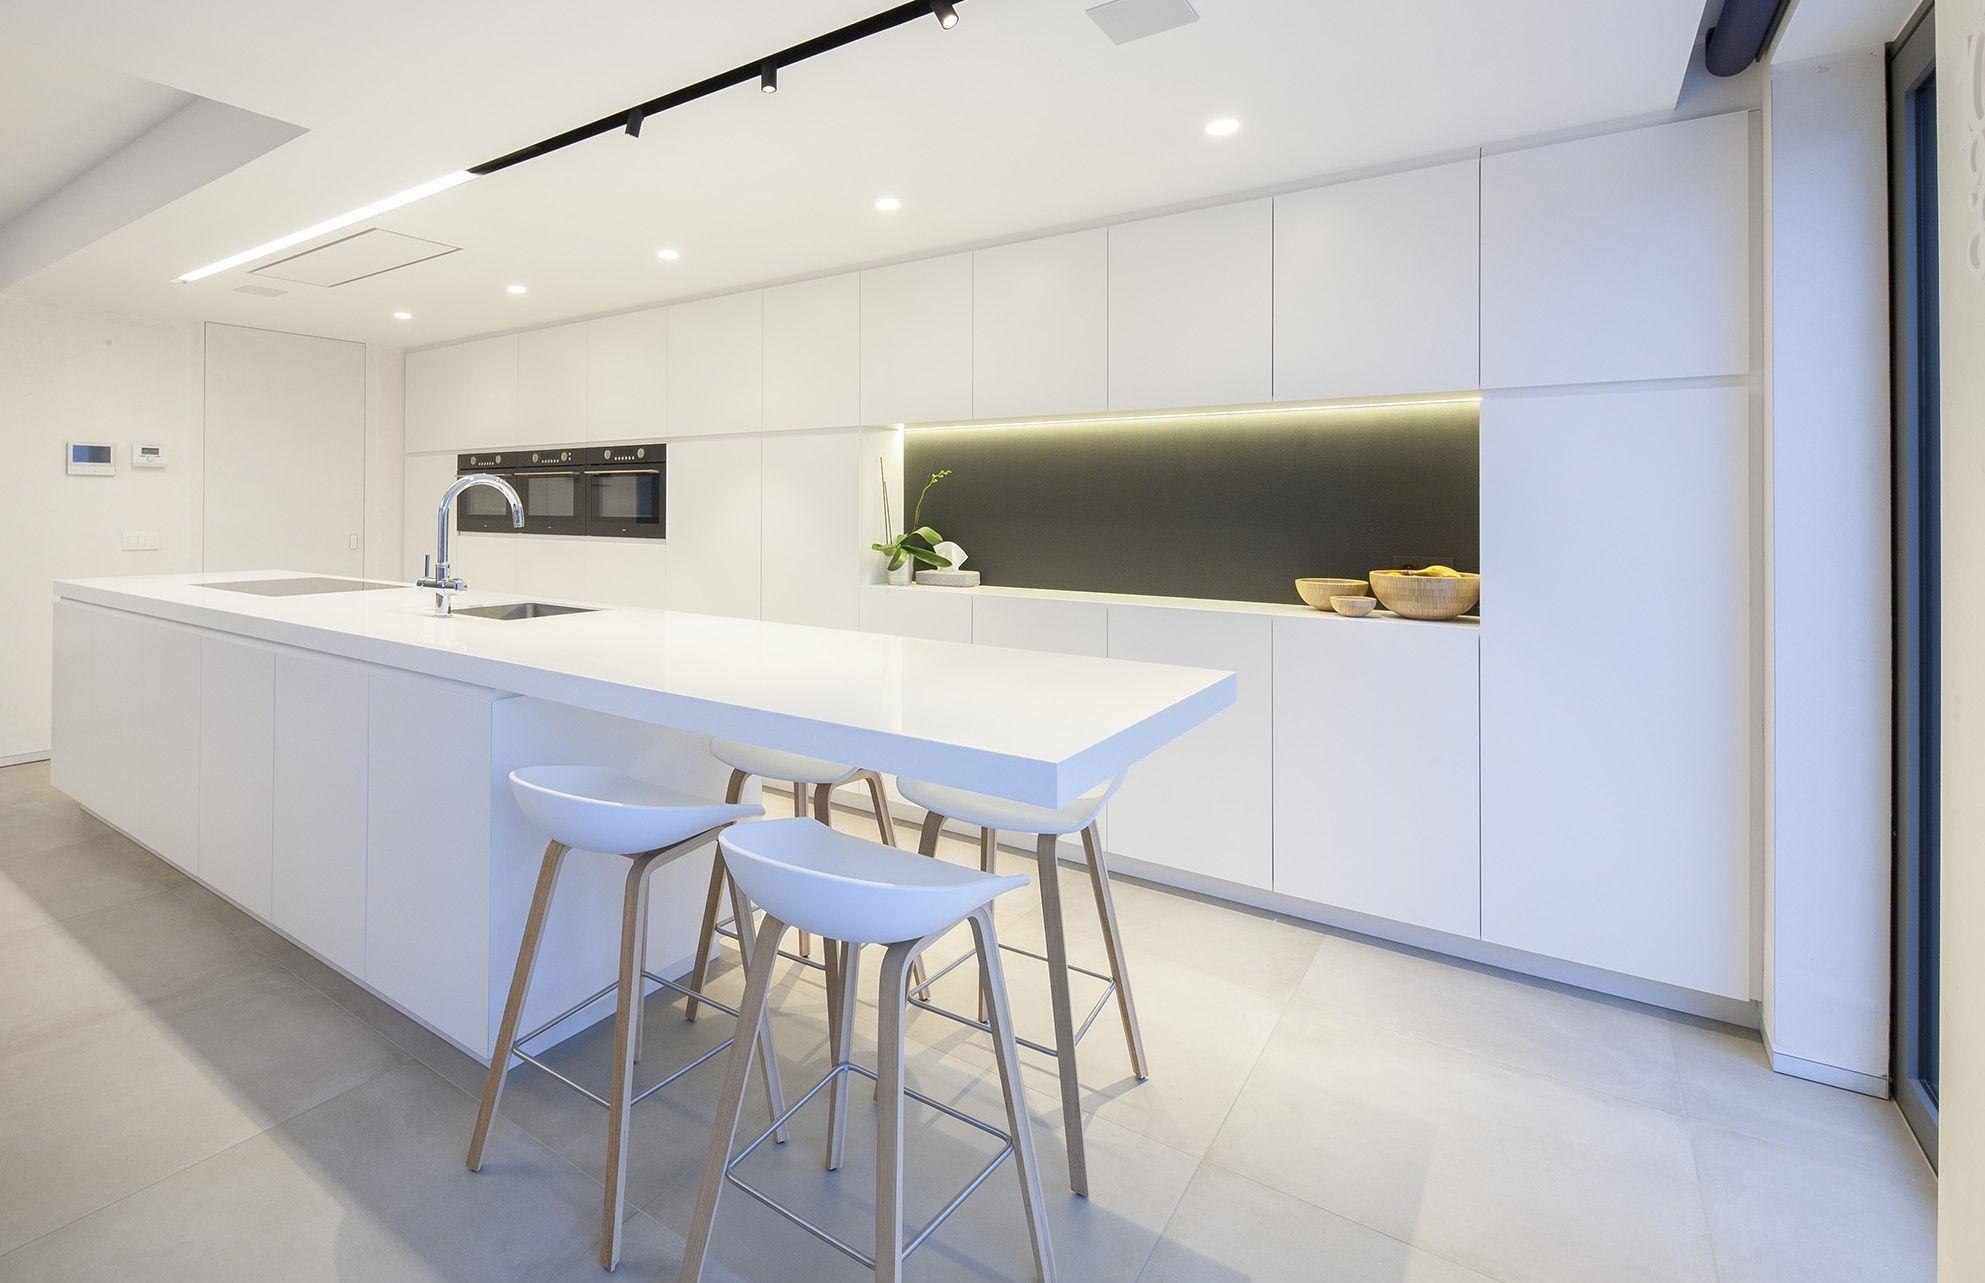 Keuken Interieur Scandinavisch : Keuken keuken extensies kitchens